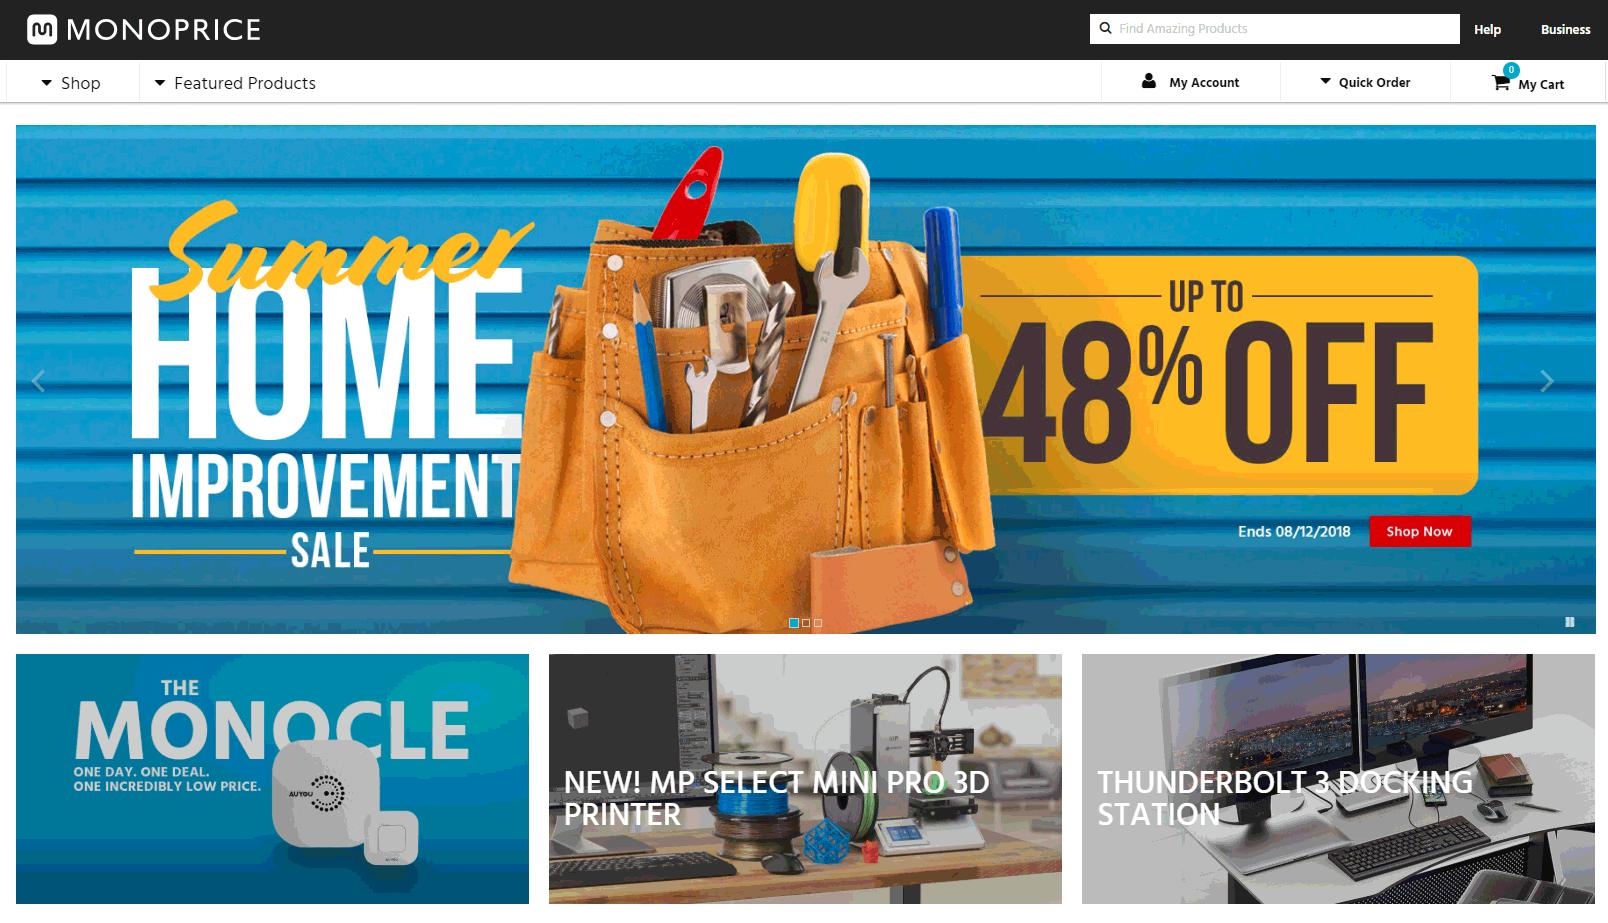 Monoprice's Homepage